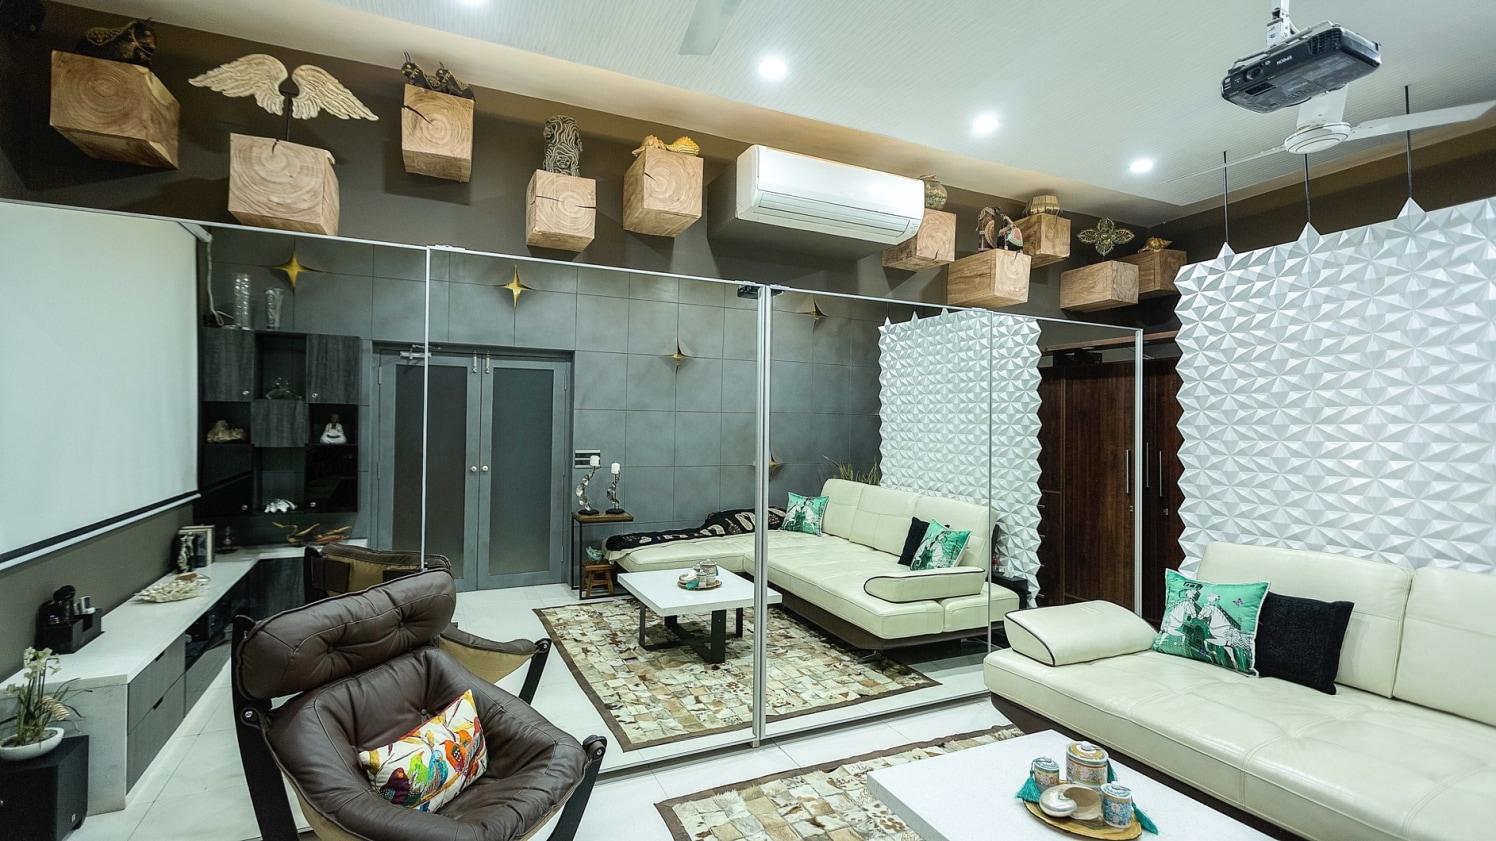 Luxurious Living Room by Swati Jain Modern | Interior Design Photos & Ideas